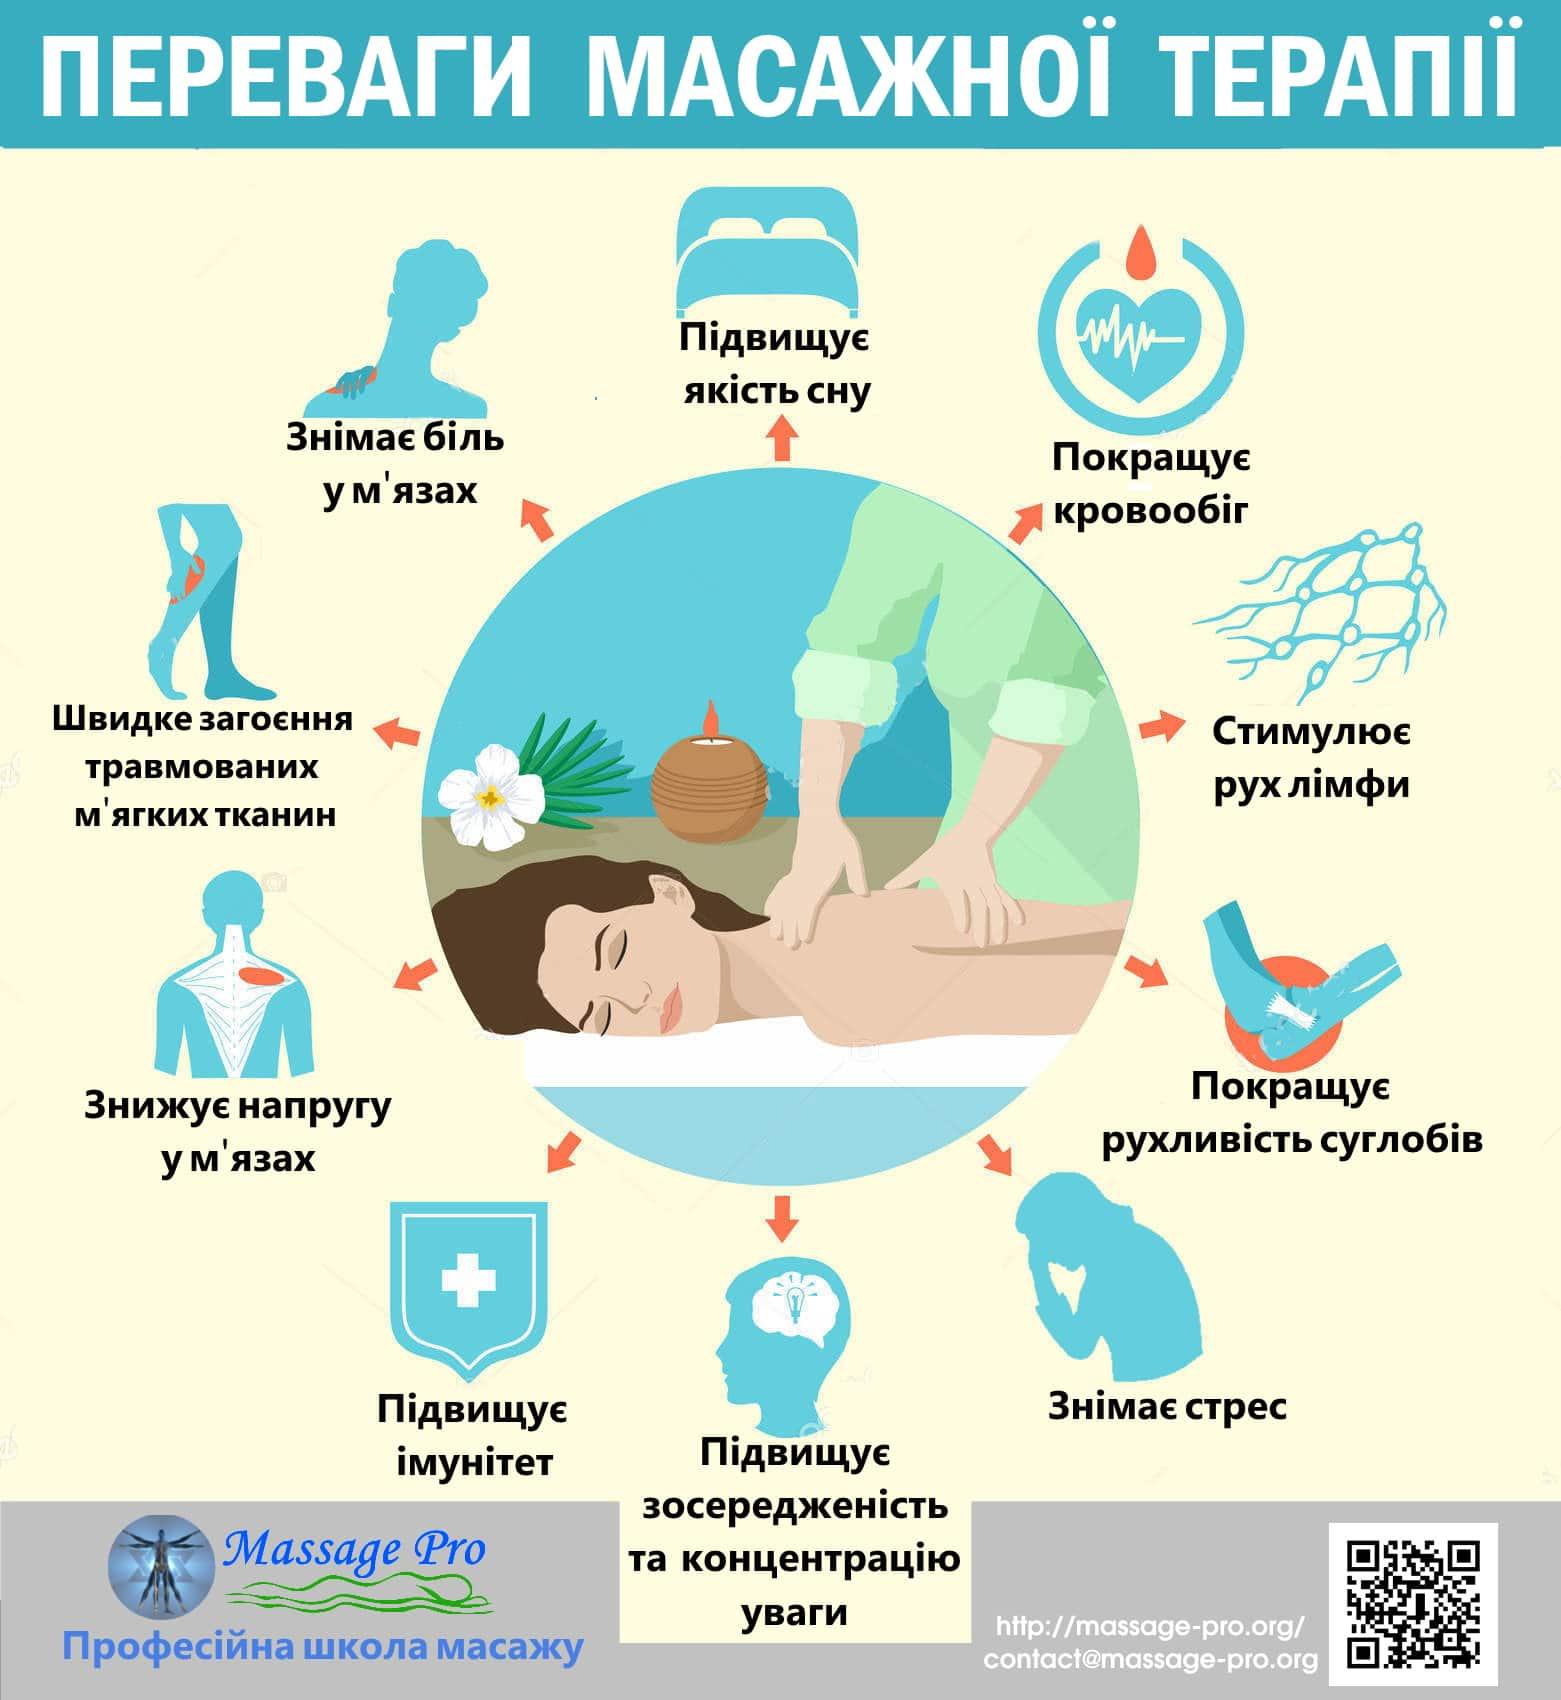 perevahy masaznoji terapiji. Infografika